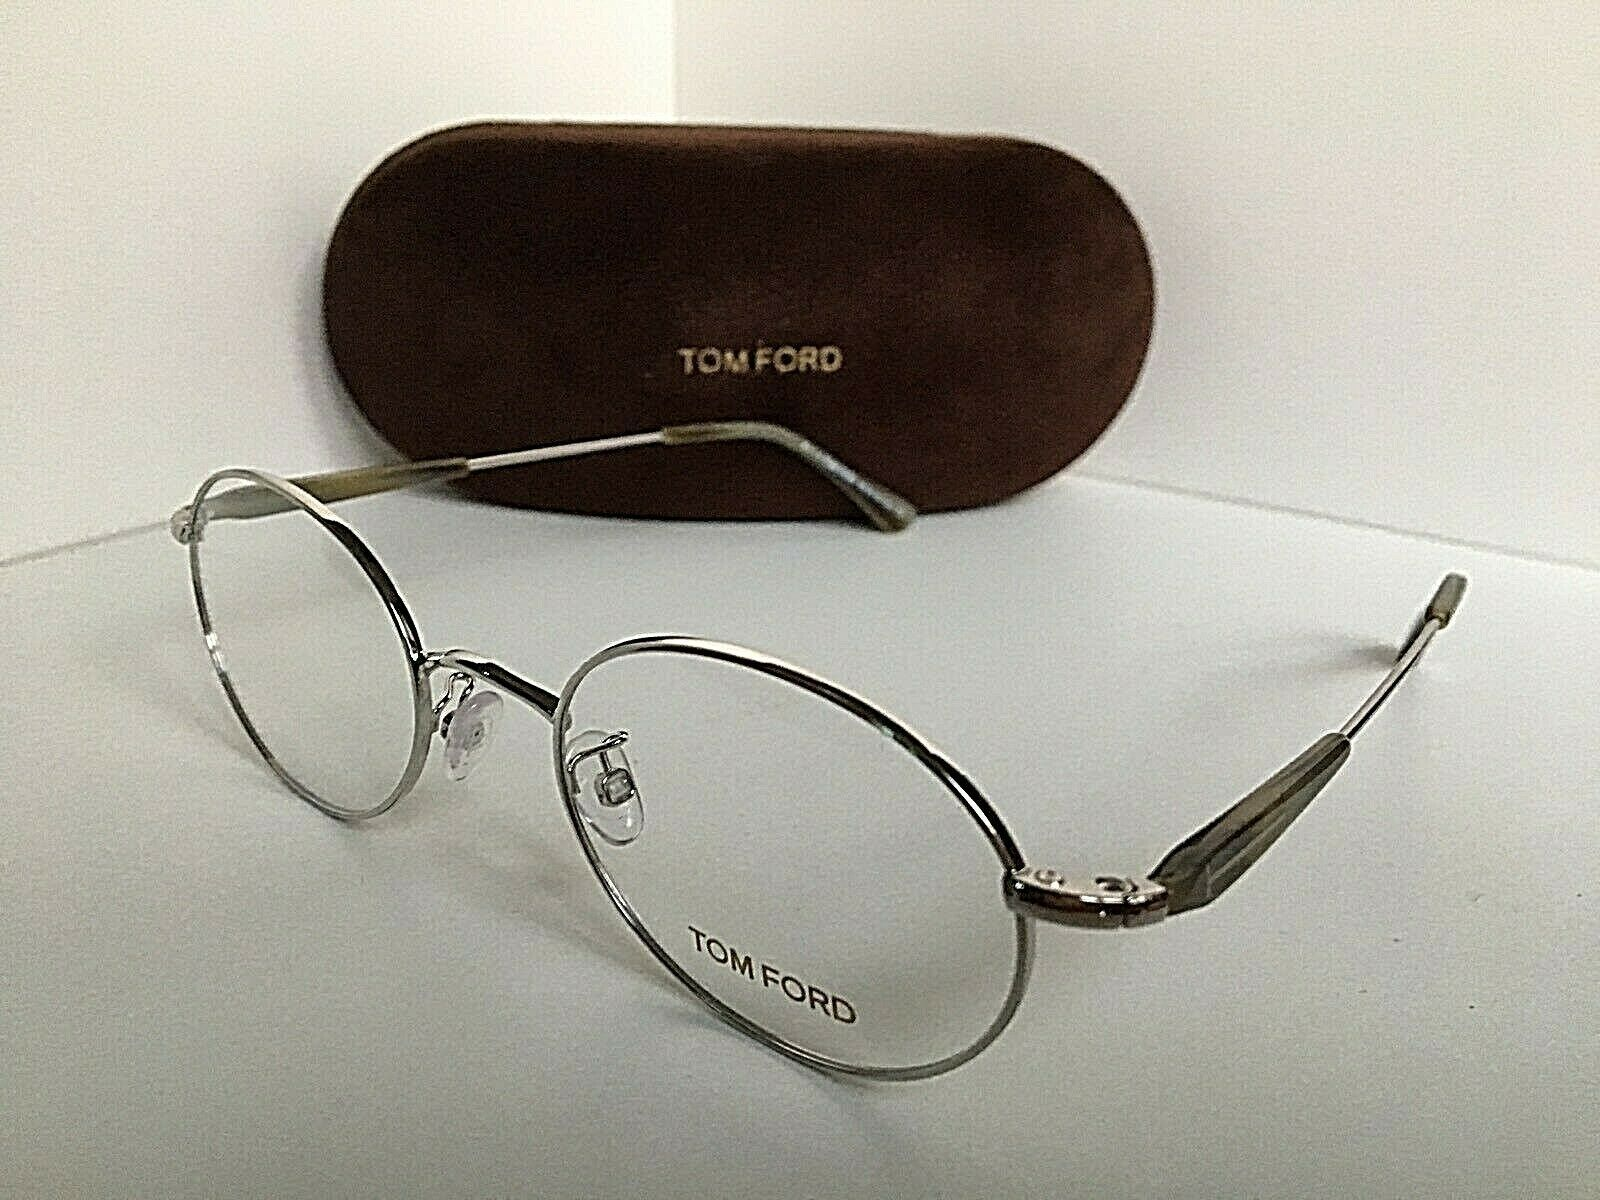 New Tom Ford TF 5345  016 51mm Rx Oval Silver Eyeglasses Frame